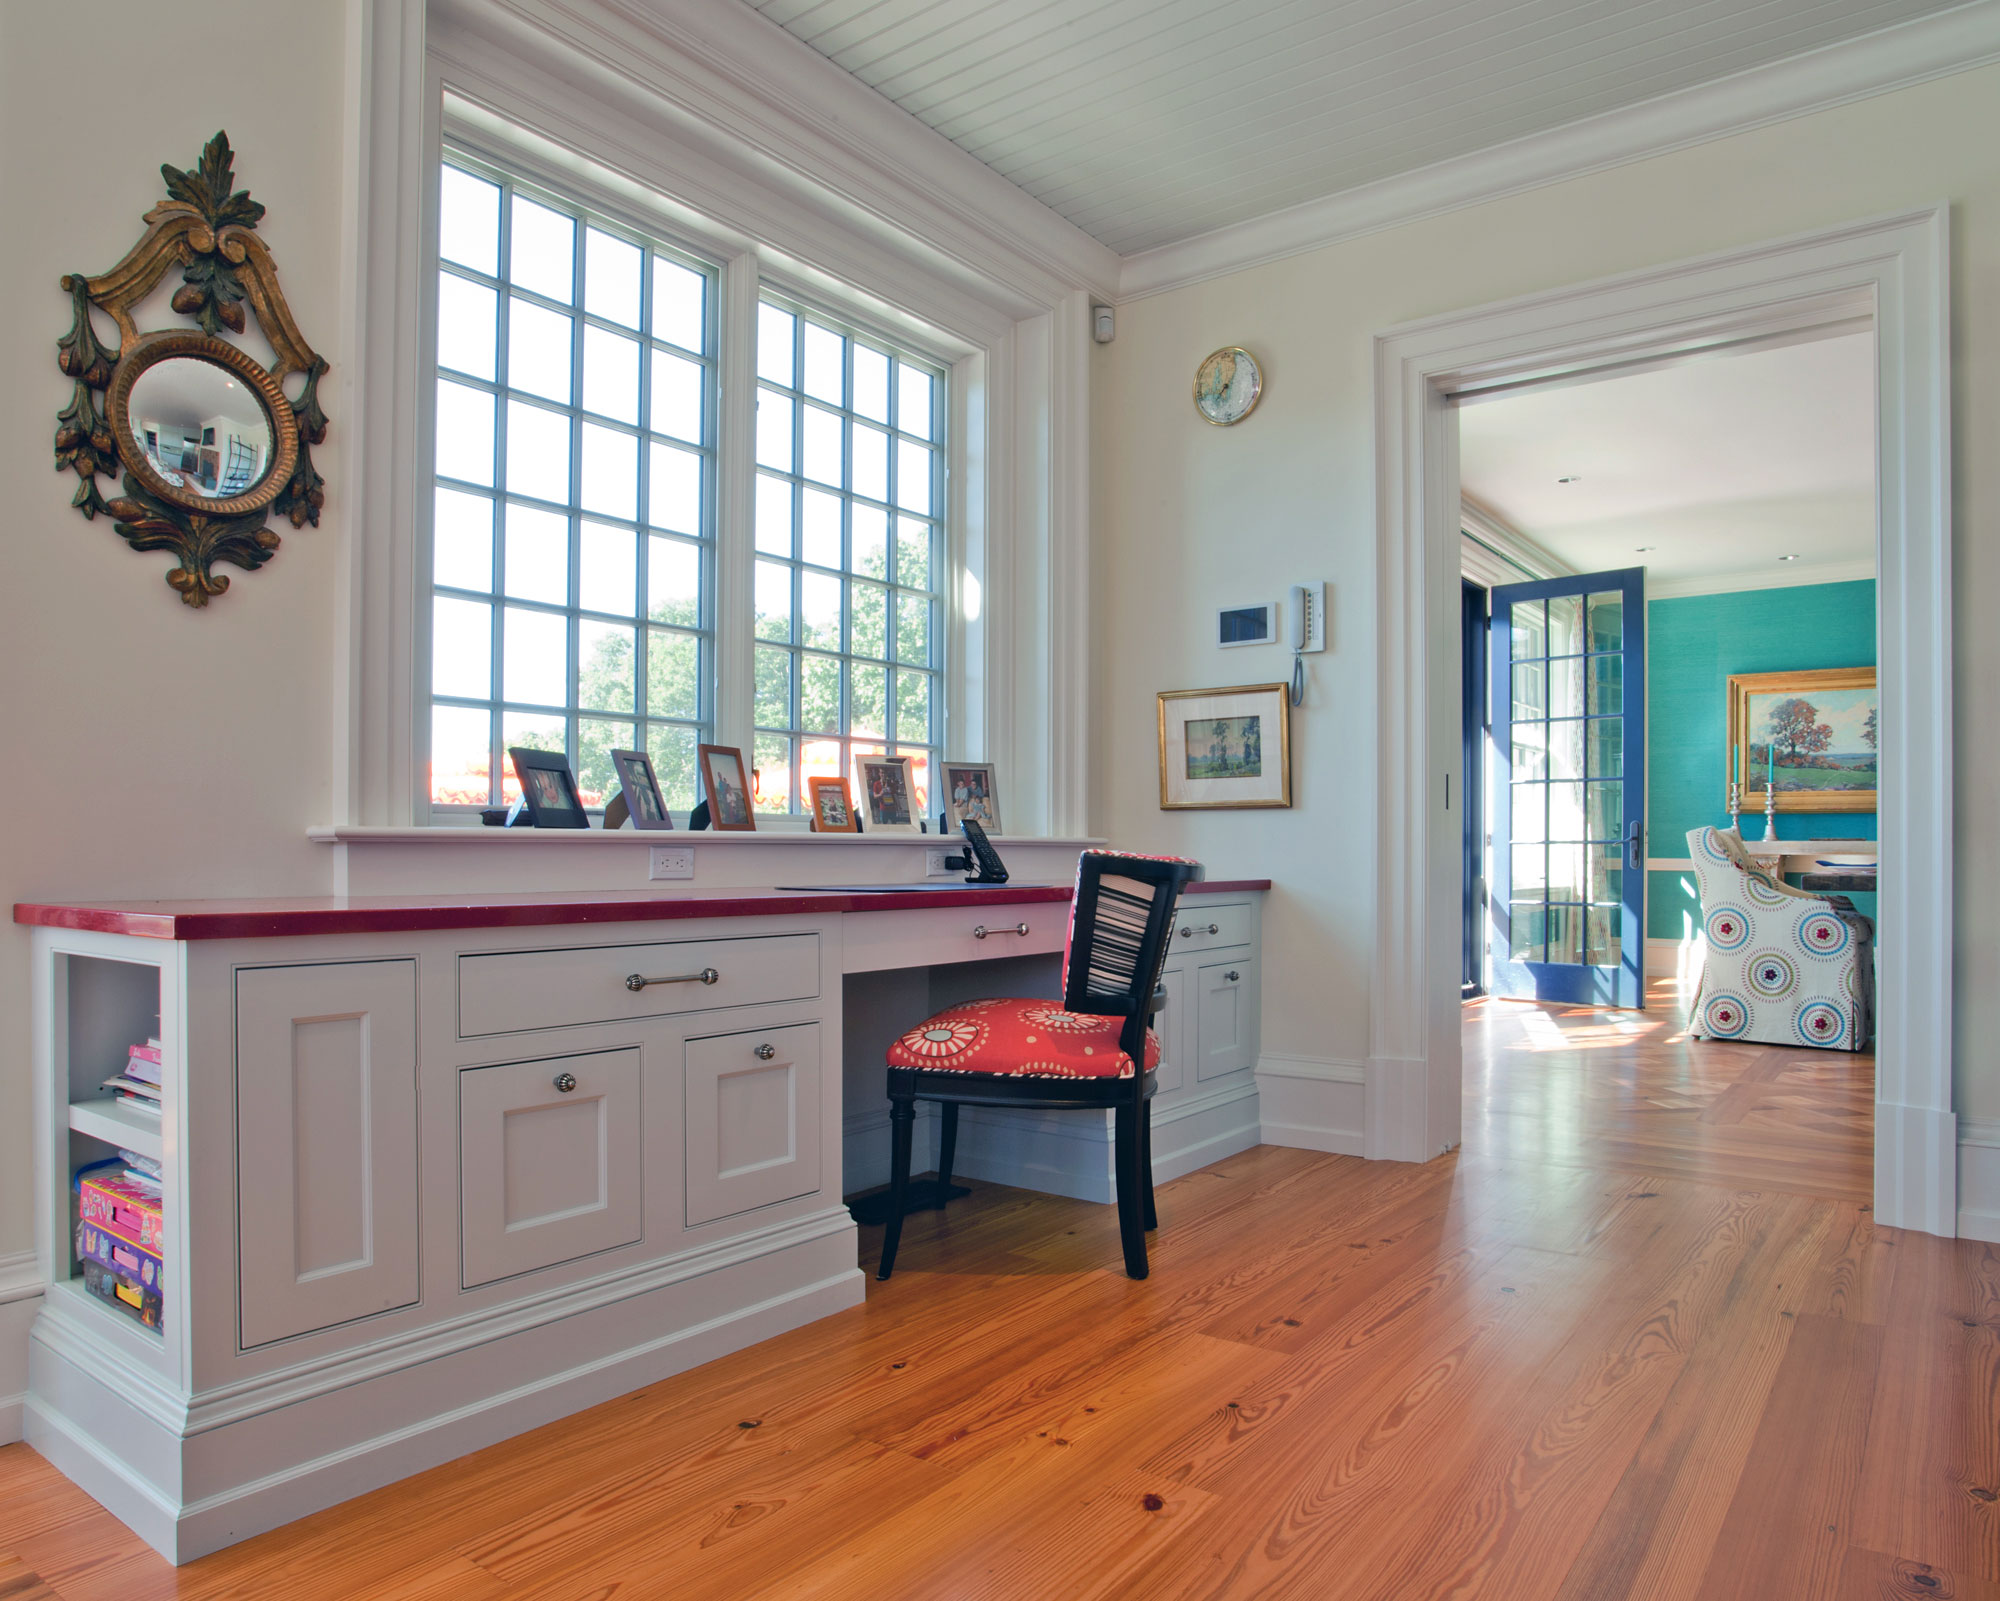 Stephen Sullivan Custom Home Builders Rhode Island Coastal Vacation Home -8